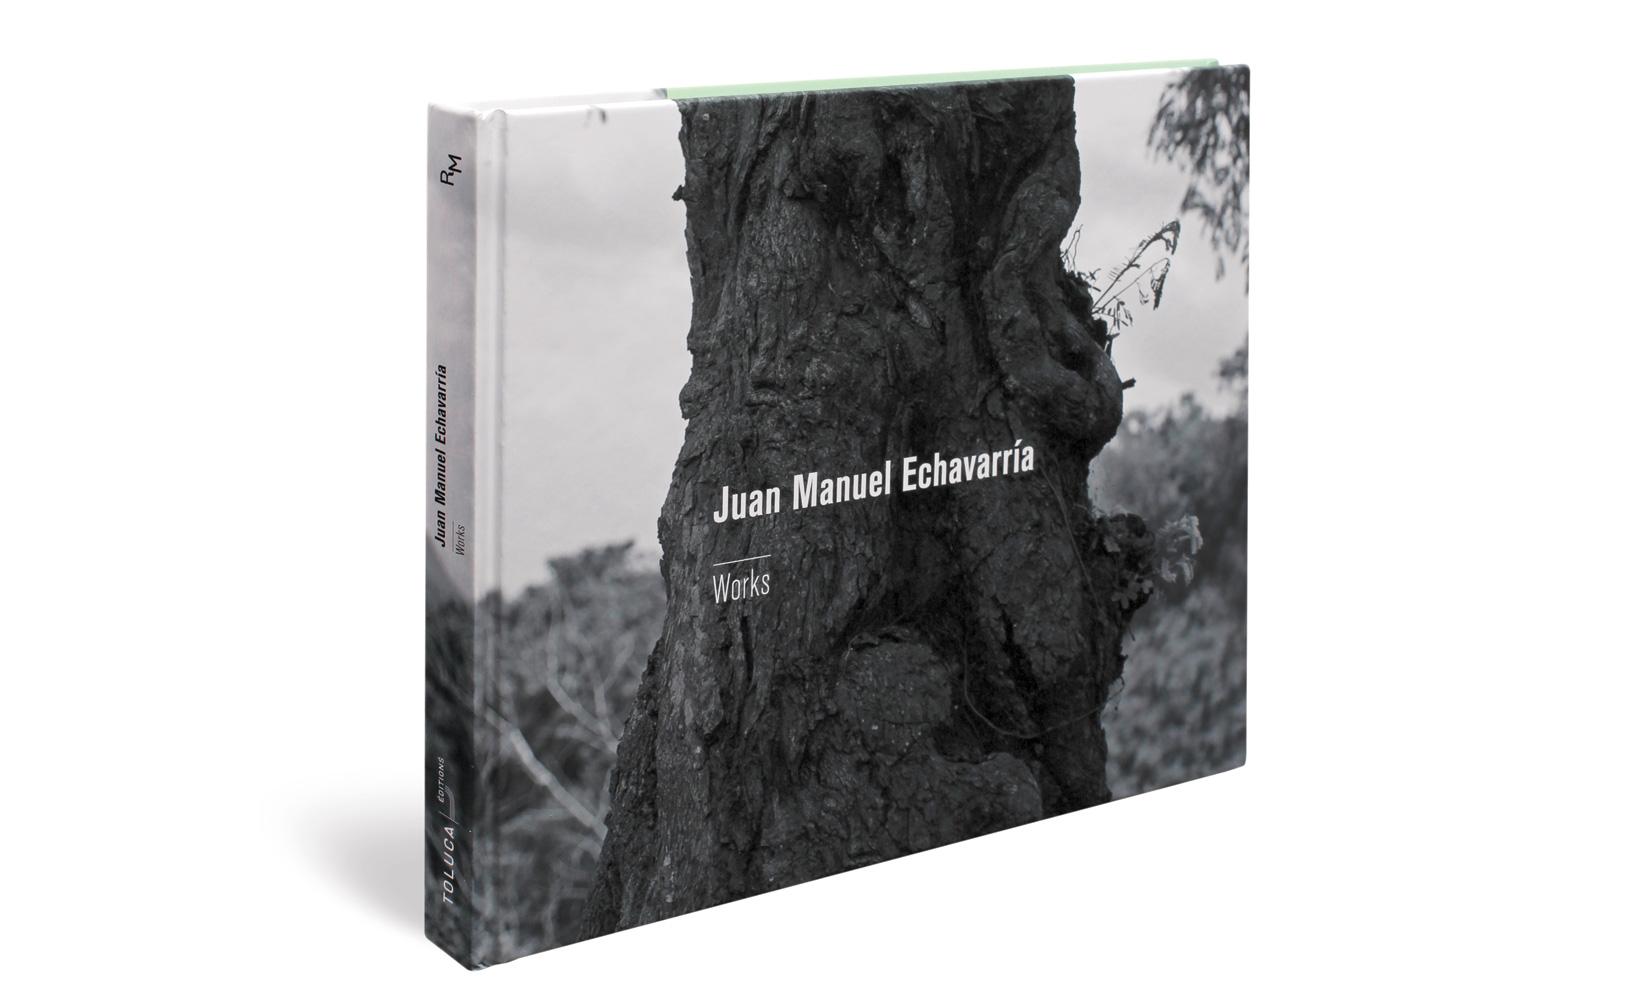 JUAN-MANUEL-ECHAVARRIA-TOLUCA-STUDIO-OLIVIER-ANDREOTTI-PERS.jpg